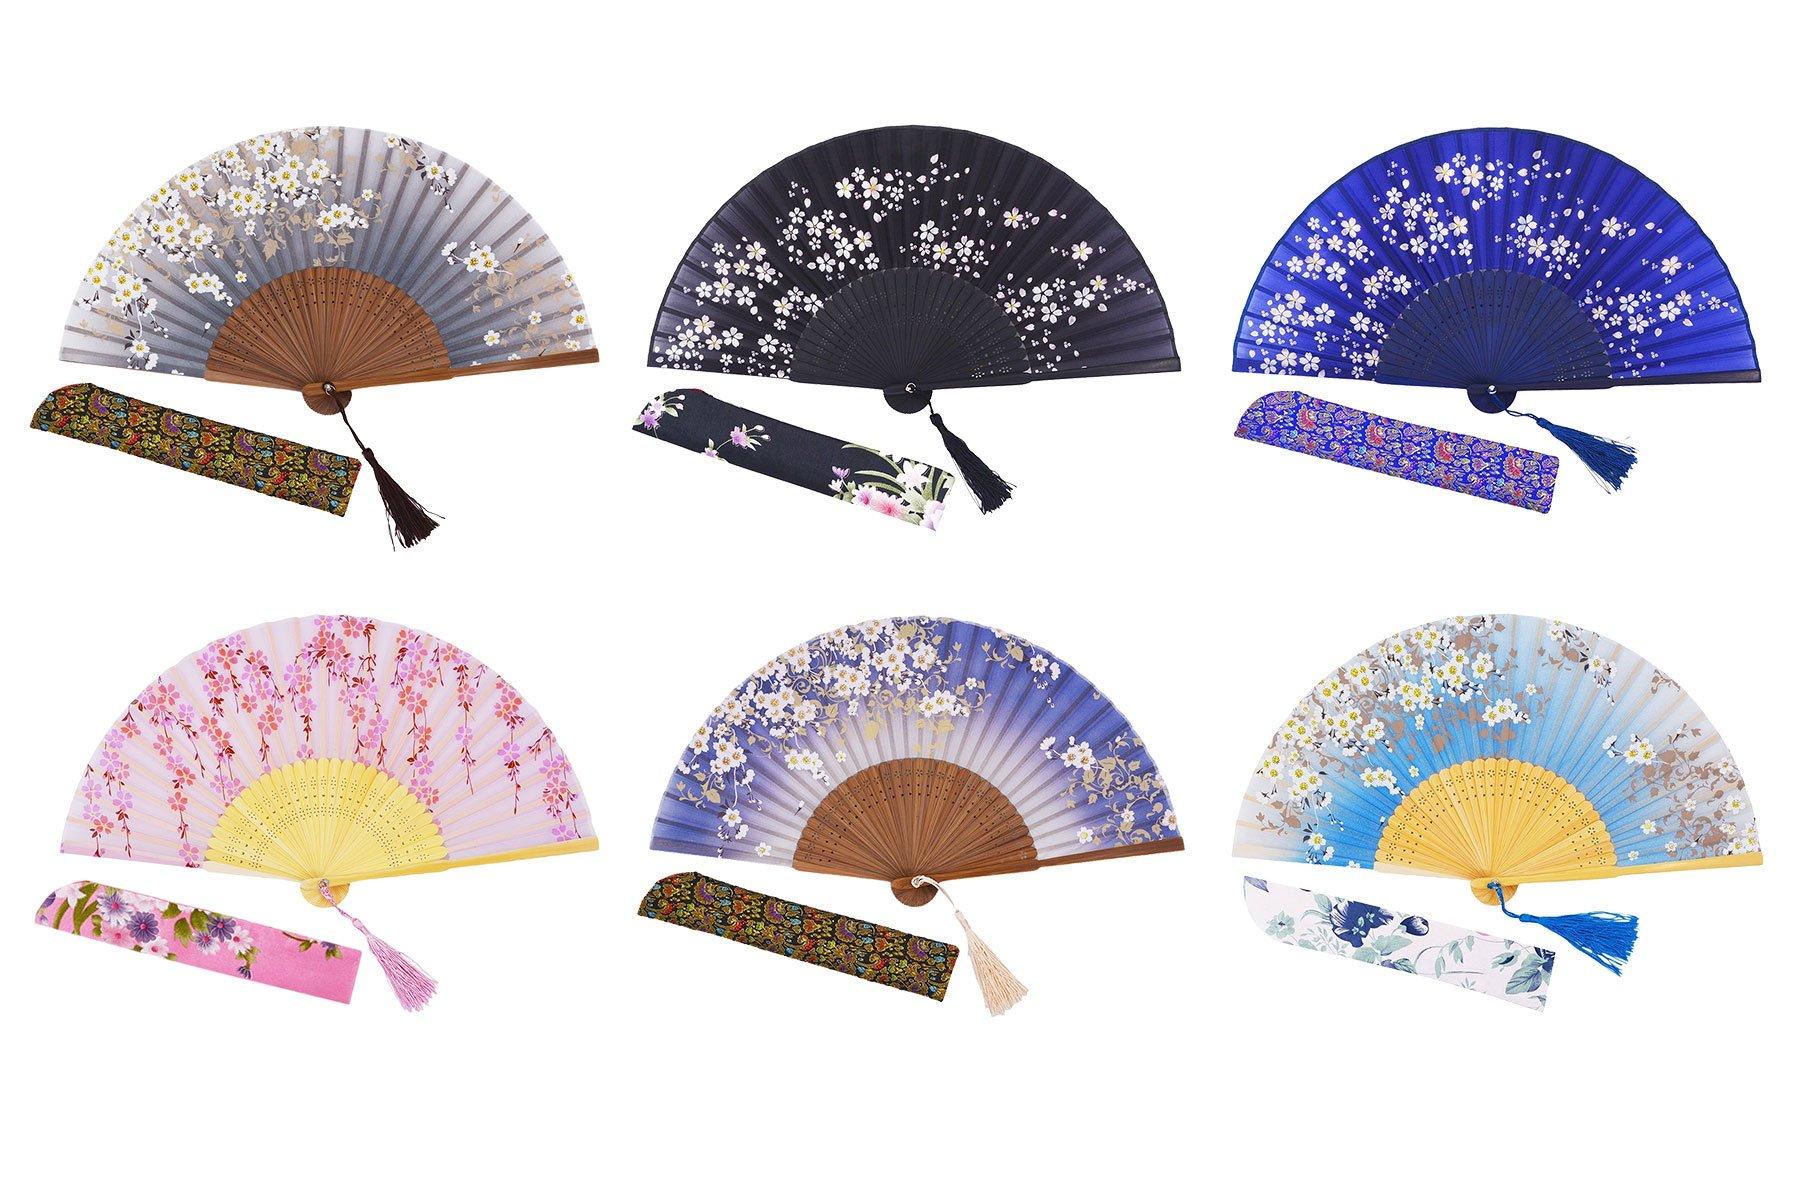 Amajiji Charming Elegant Modern Woman Handmade Bamboo Silk 8.27'' (21cm) Folding Pocket Purse Hand Fan (Mixed Colors, 6pcs) by Amajiji